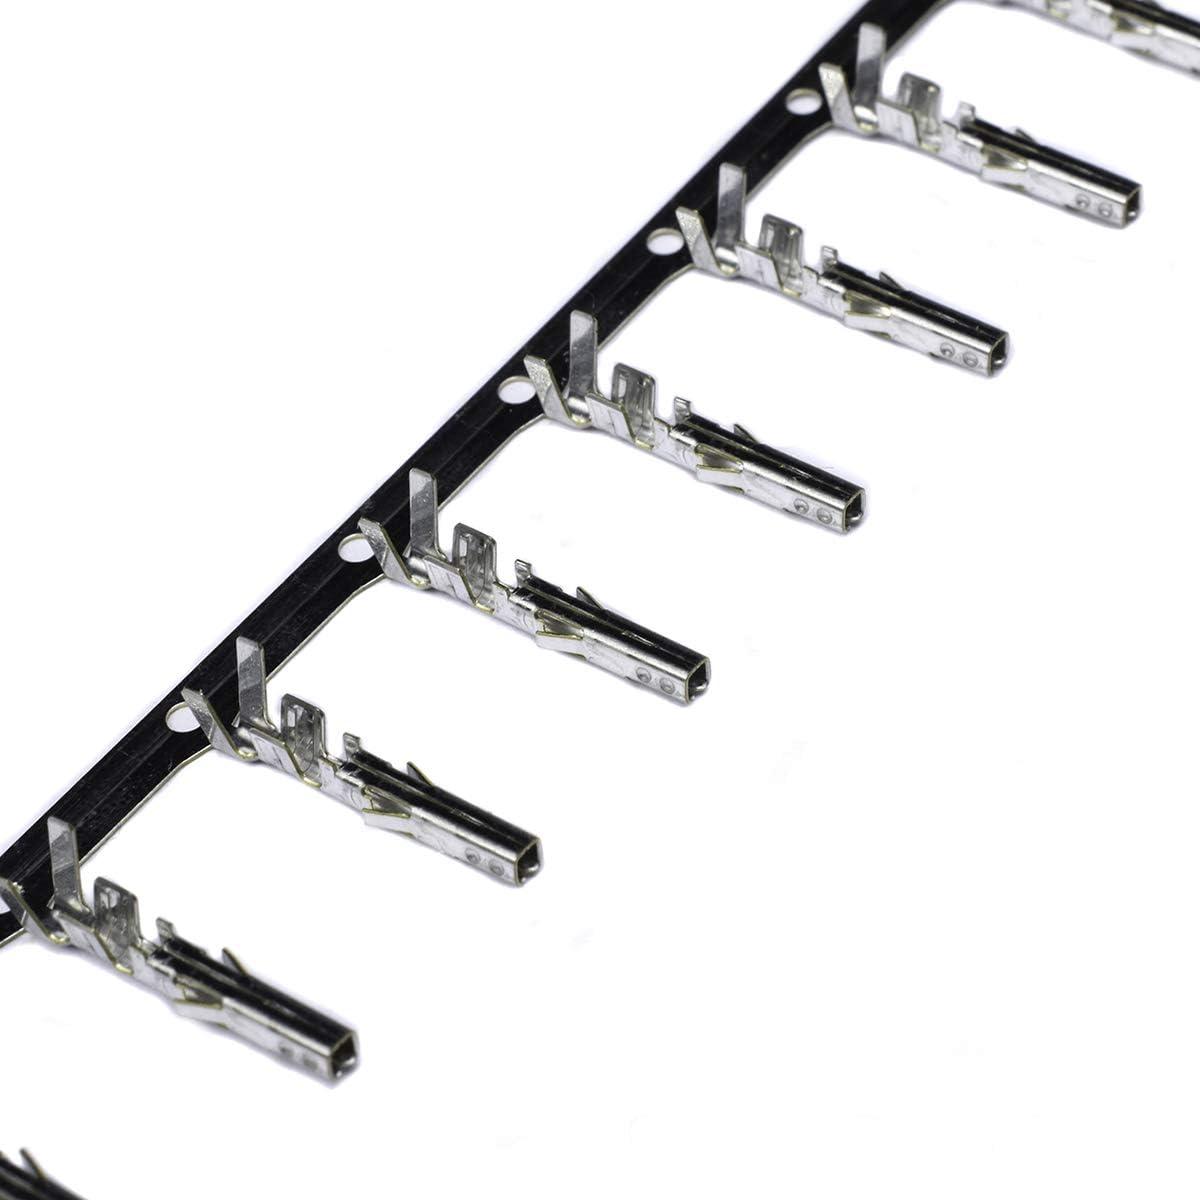 EPS and PCIE Connectors Molex Mini Fit Jr 16awg Female Crimp Terminal for ATX 100-pack